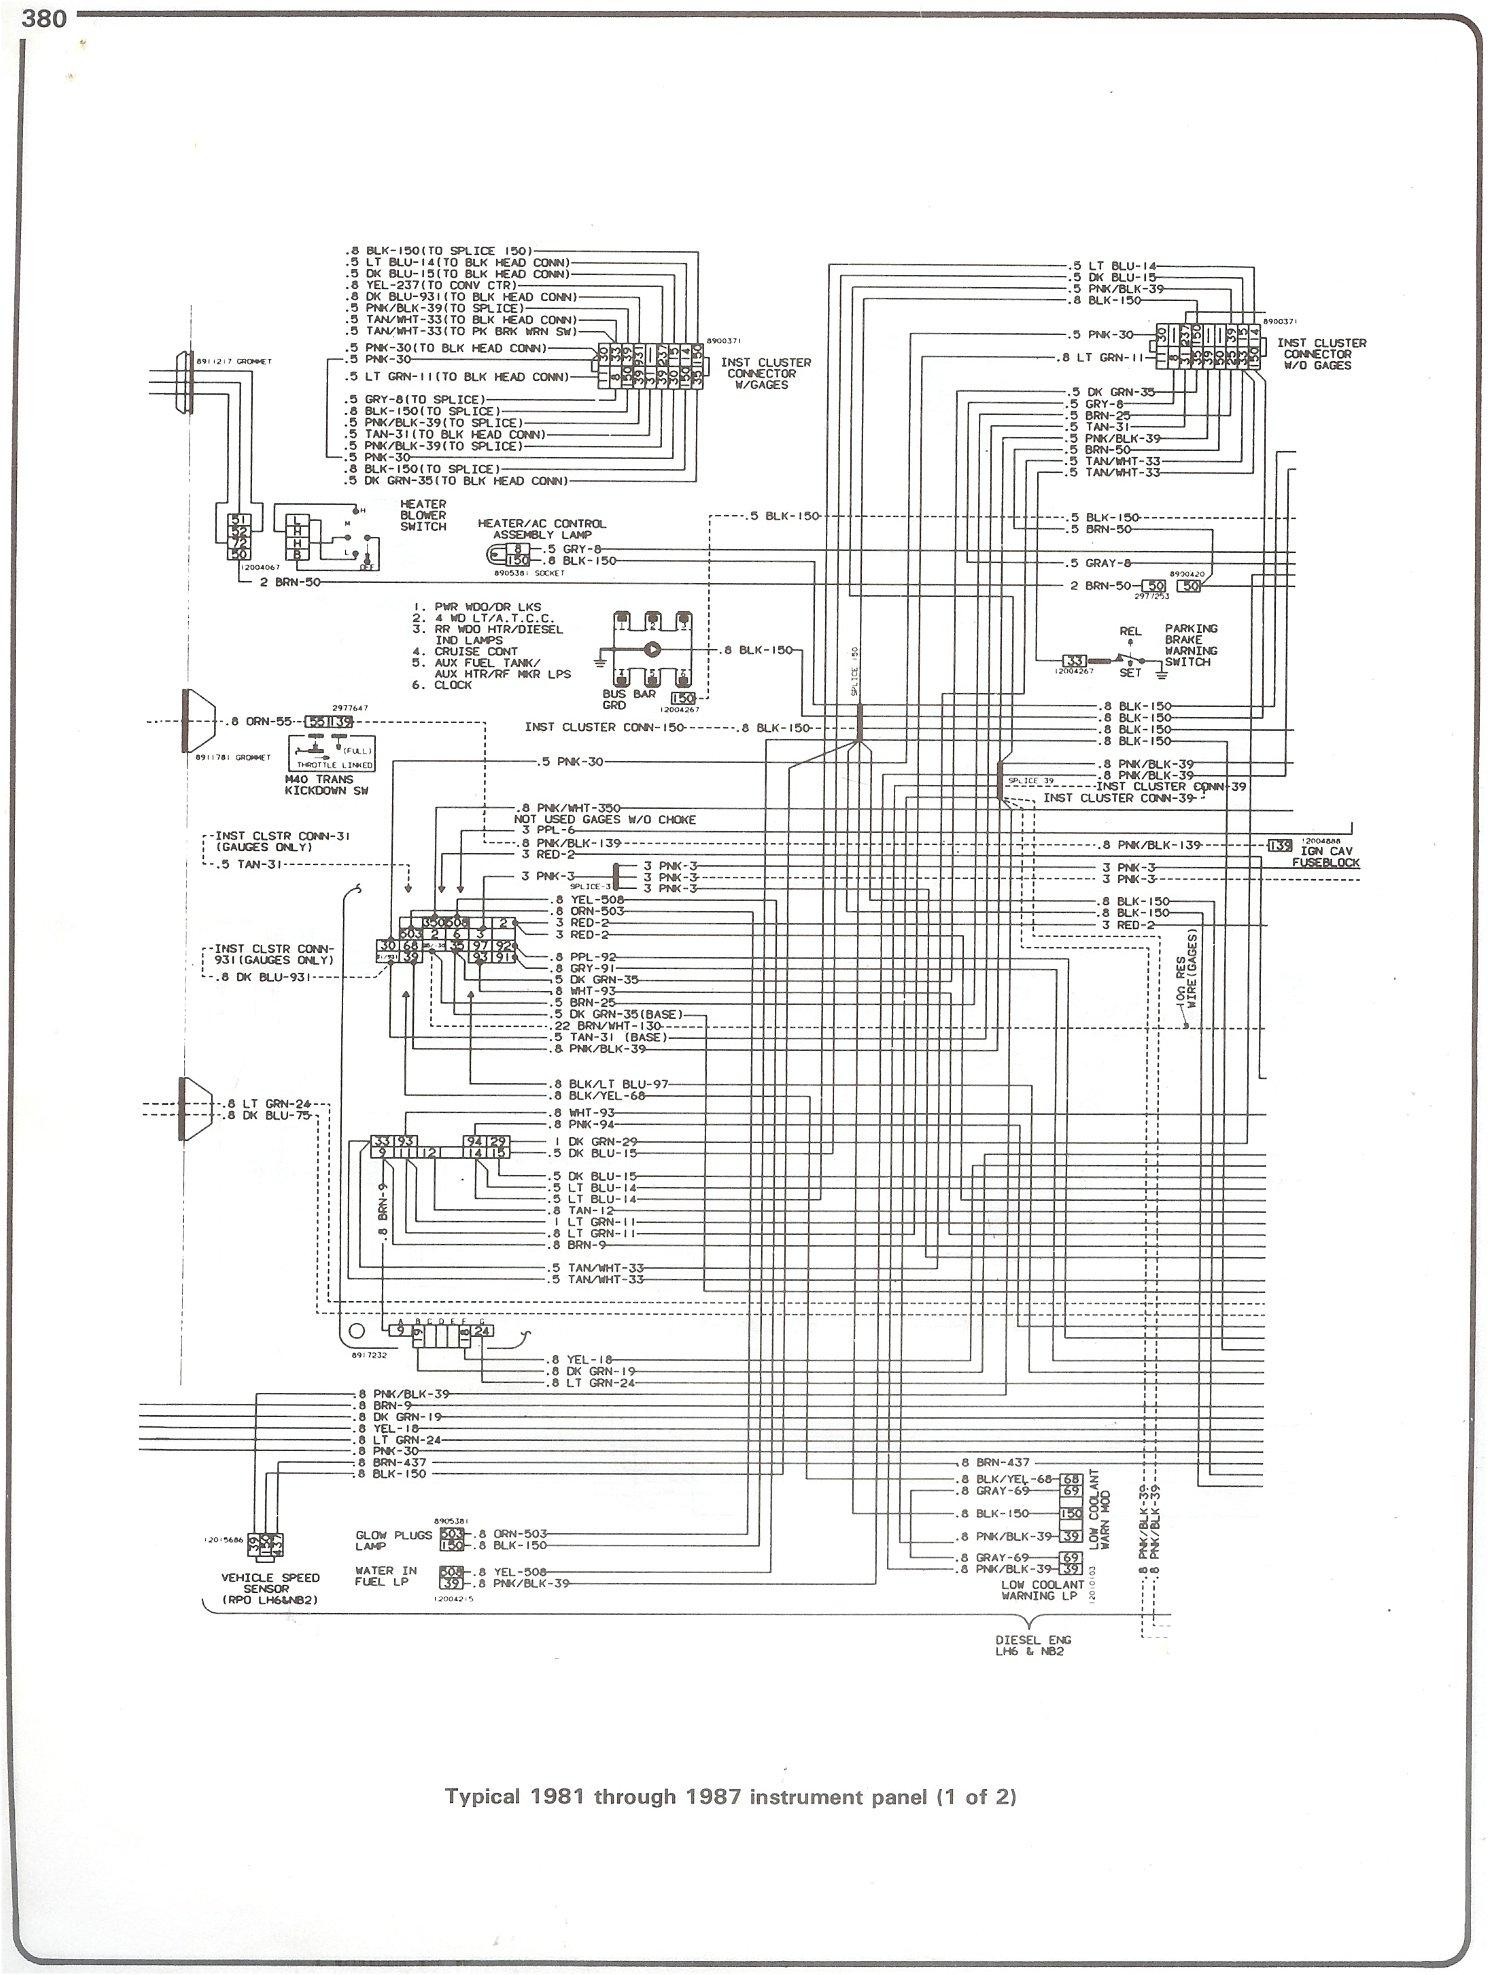 1999 Chevrolet P30 Wiring Diagram - Wiring Diagrams Hubs - 1985 Chevy Truck Wiring Diagram